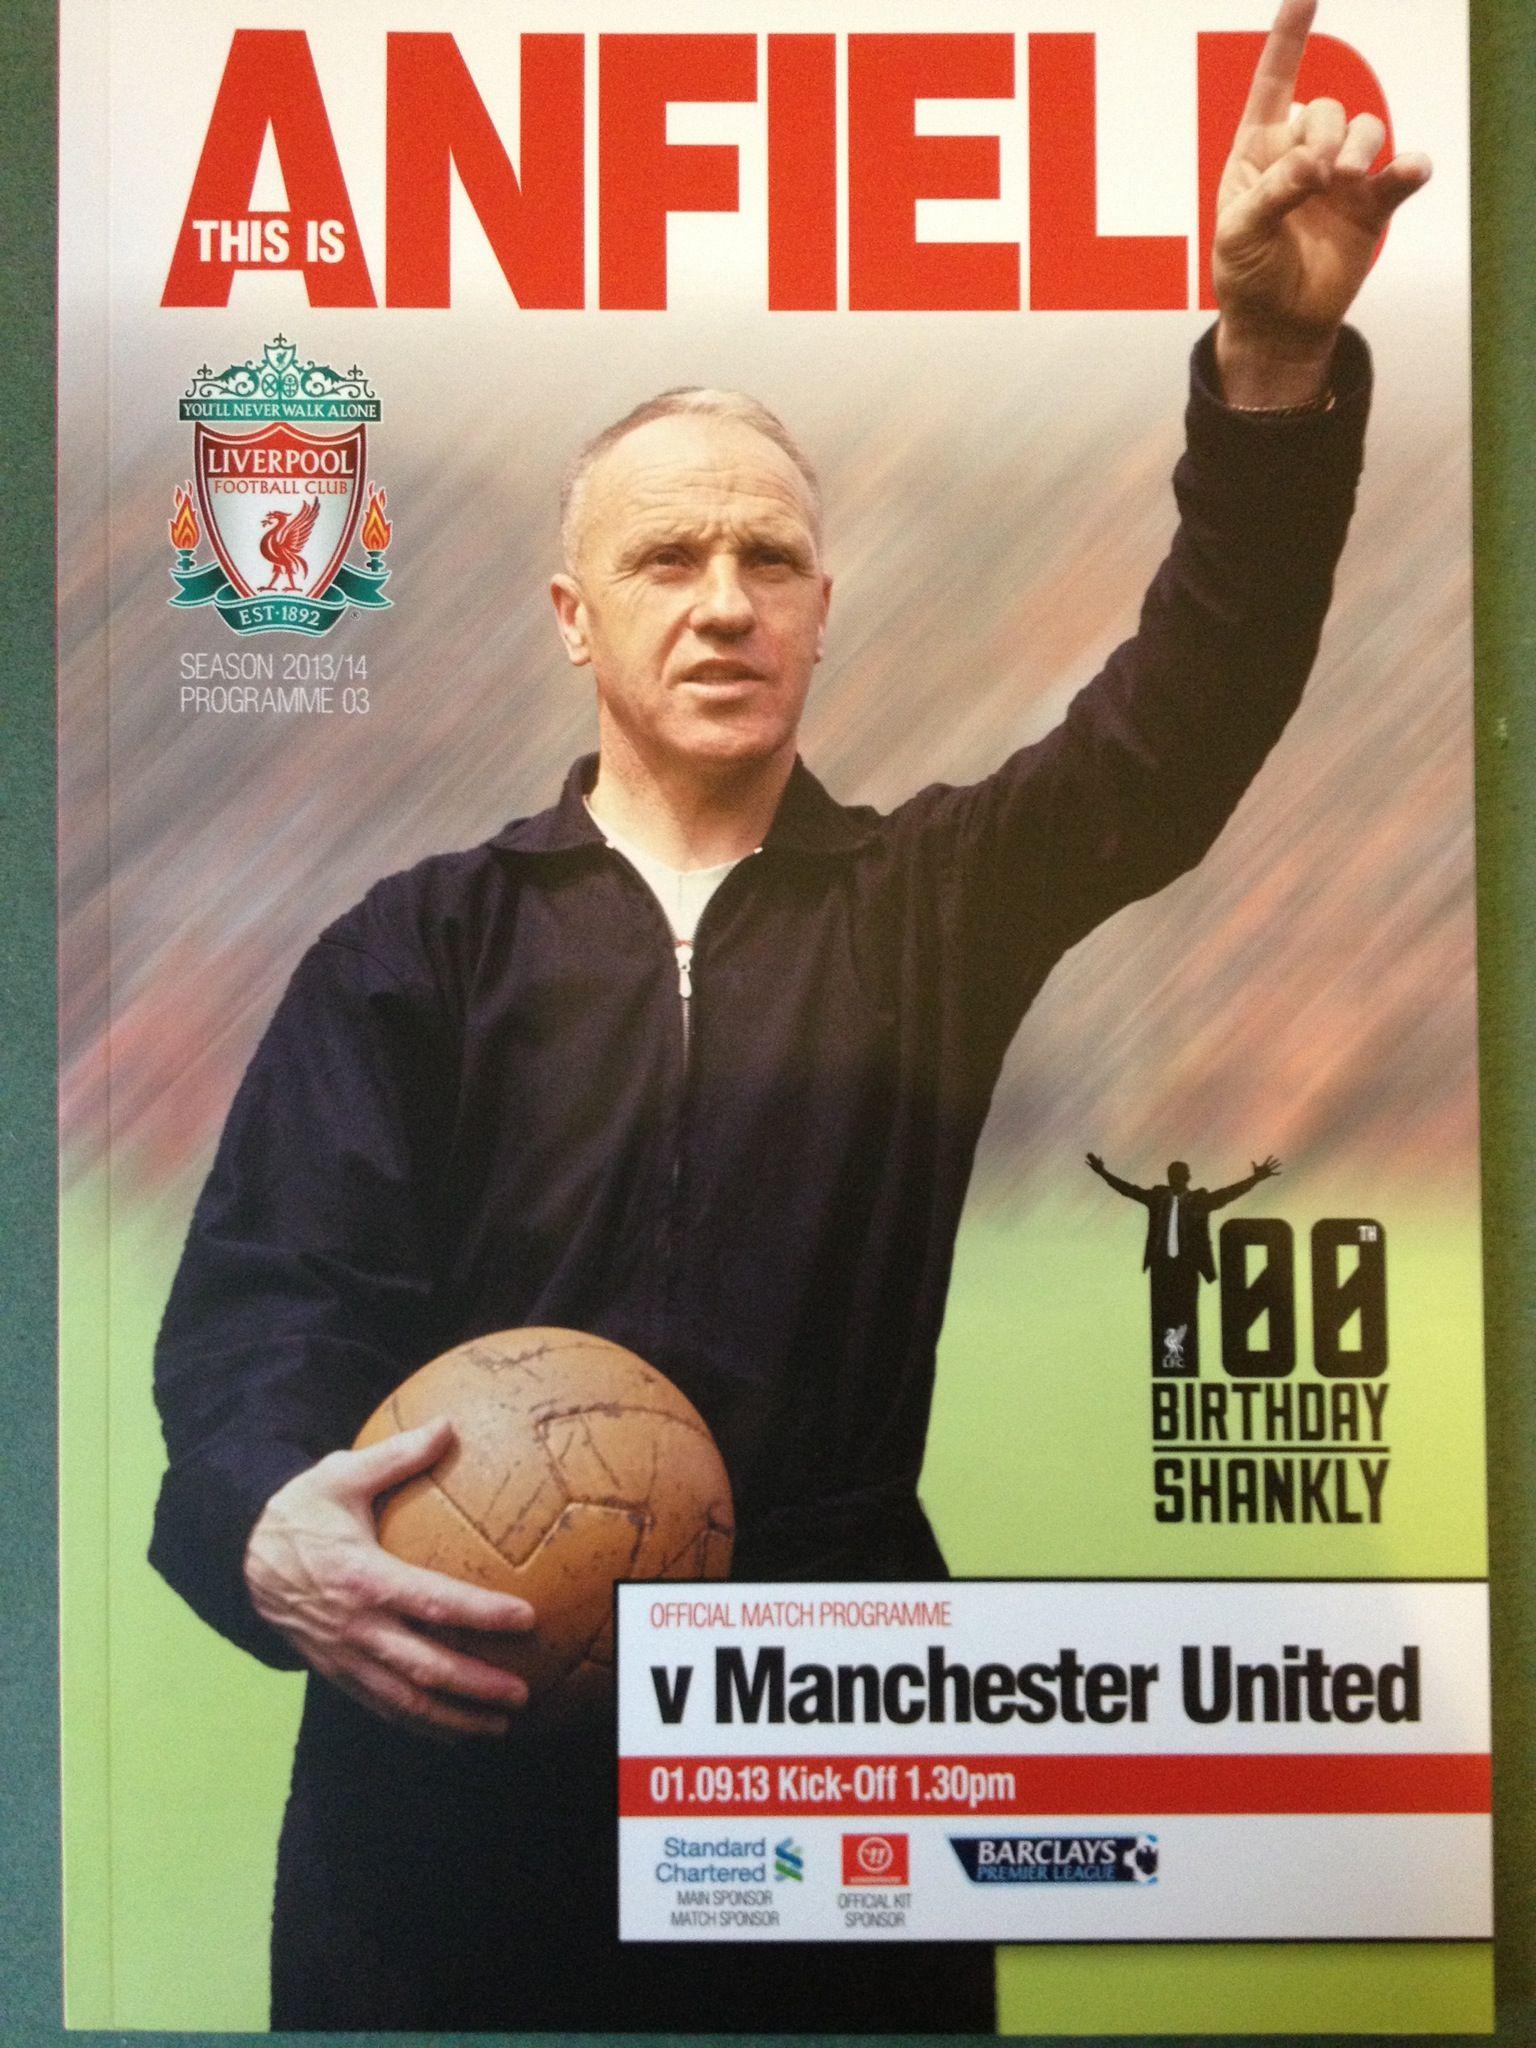 1/9/2013 Liverpool v Manchester United